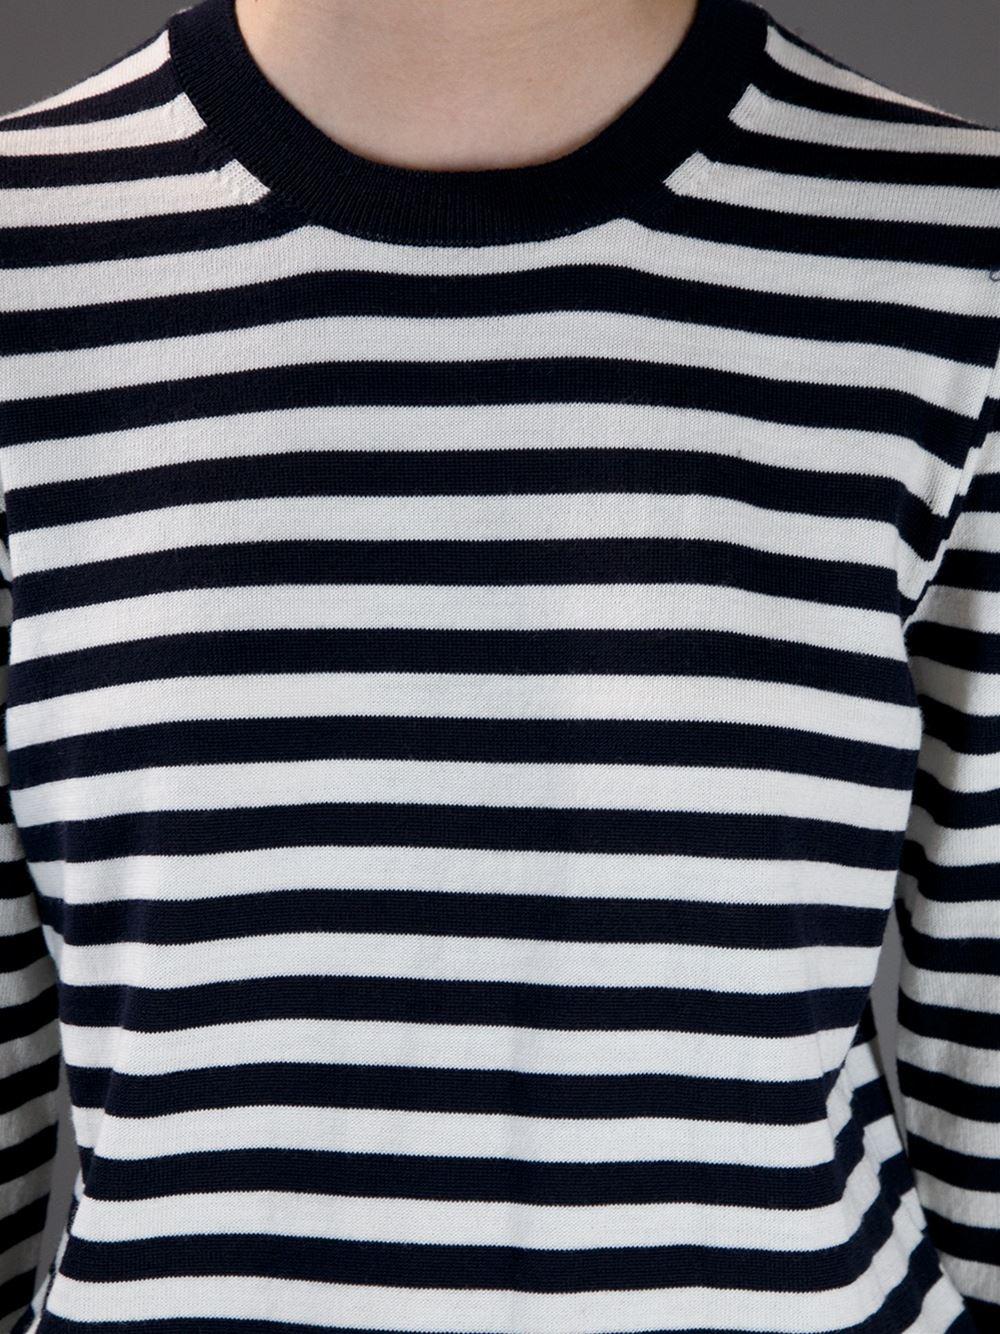 Comme des garçons shirt striped crew neck sweater